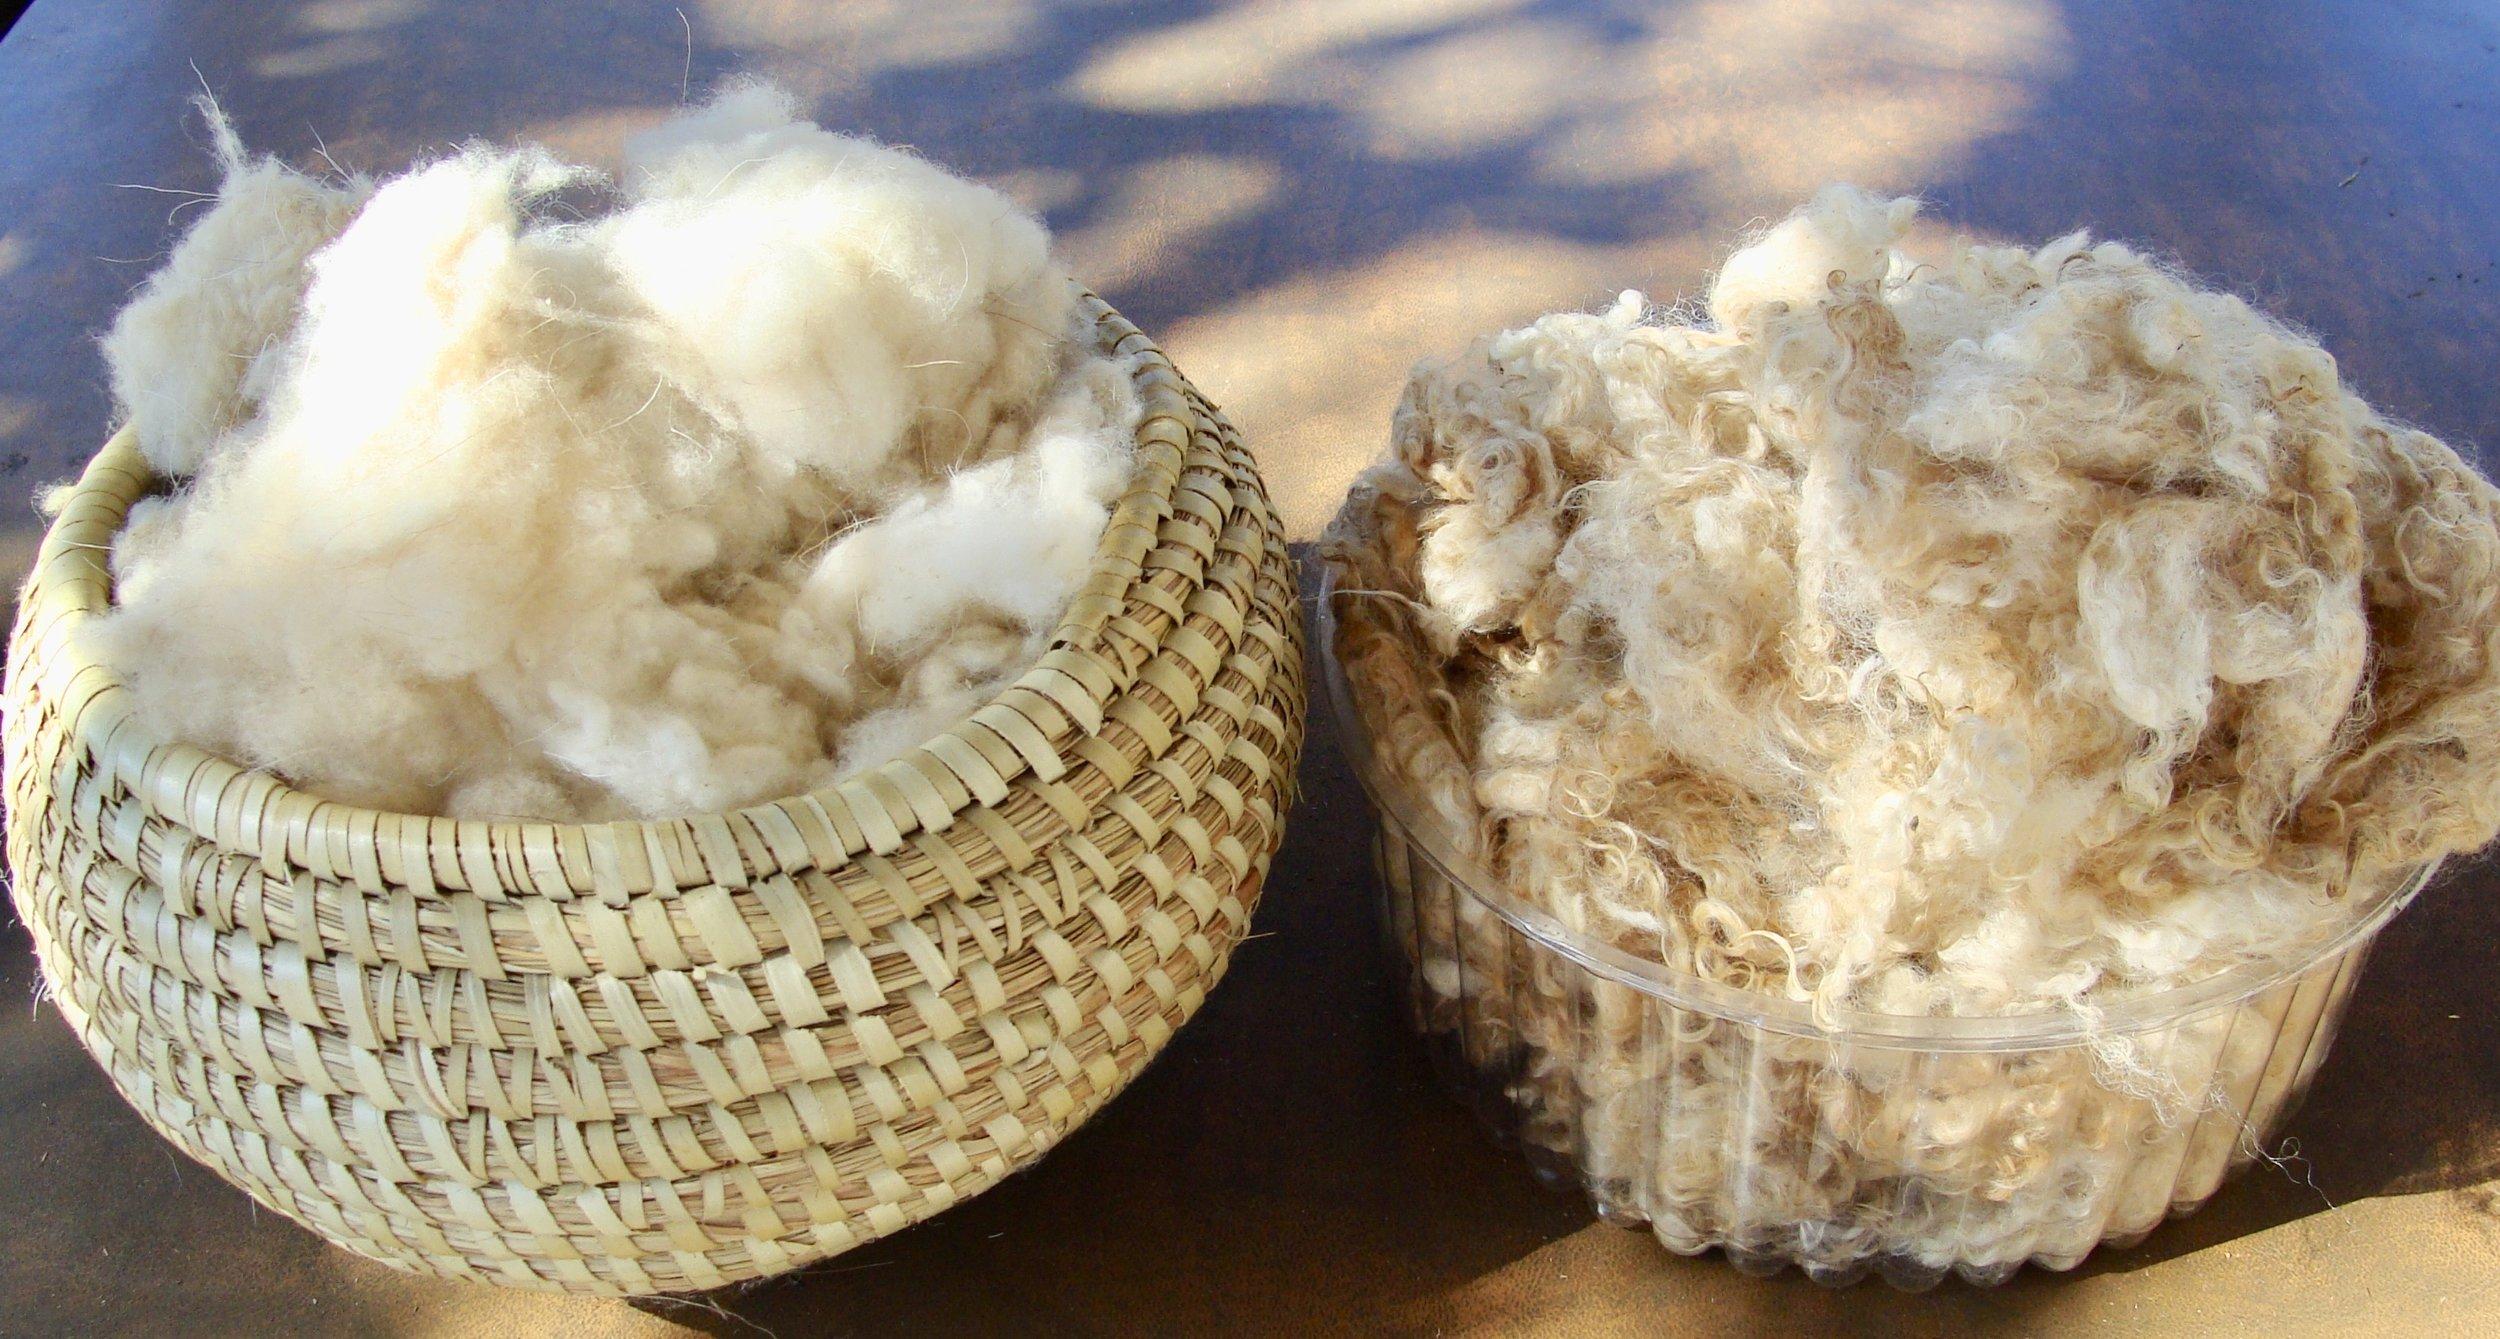 cashmere fiber (left) and mohair fiber (right)